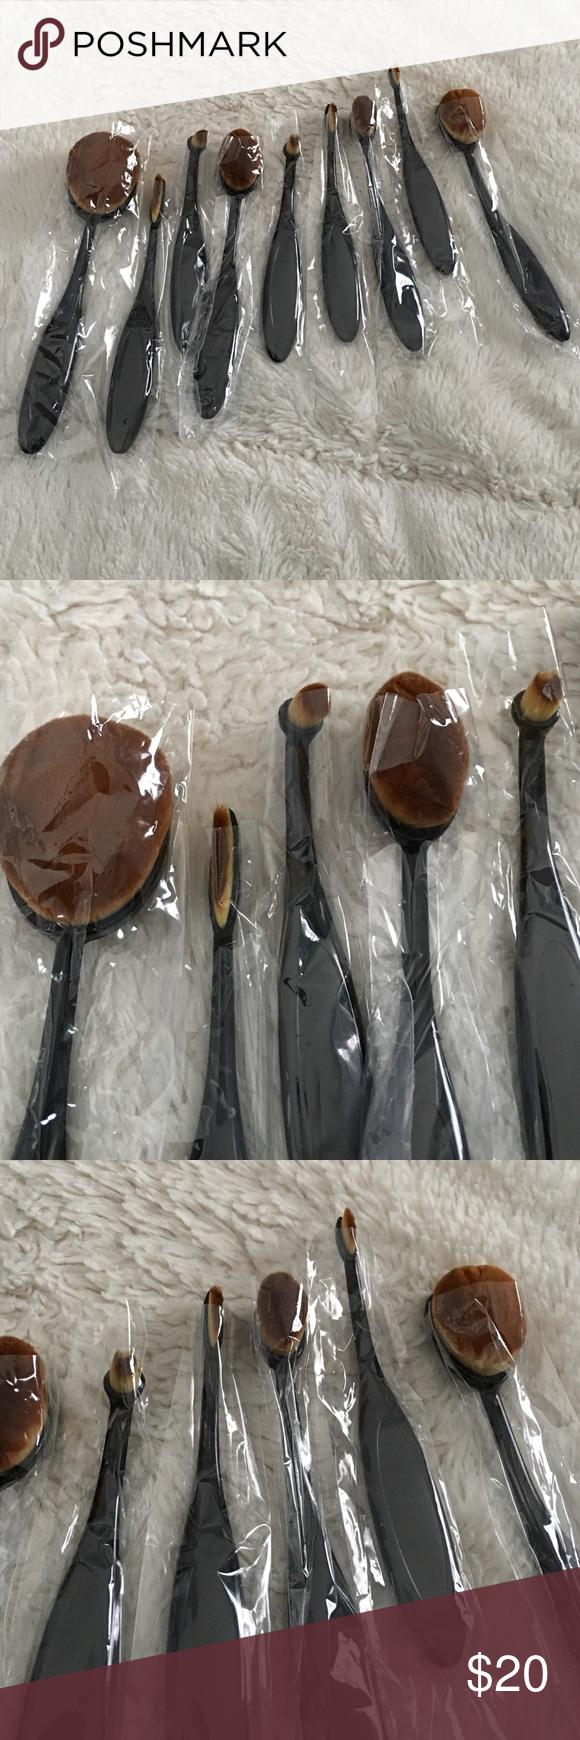 brand new🎉 make up brushes!! 🚨price drop!🚨 Oval brush